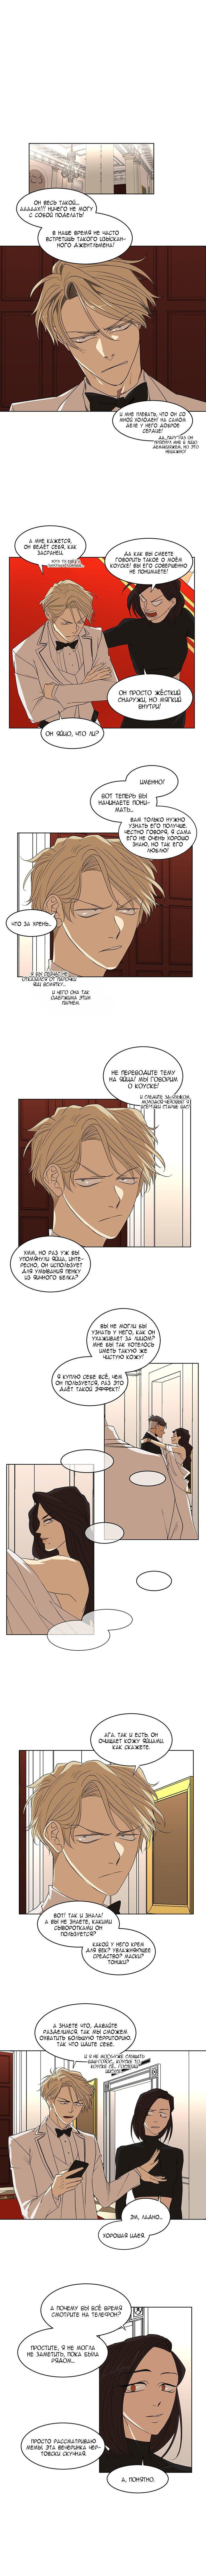 Манга Я люблю Ю / I love Yoo  - Том 1 Глава 58 Страница 5